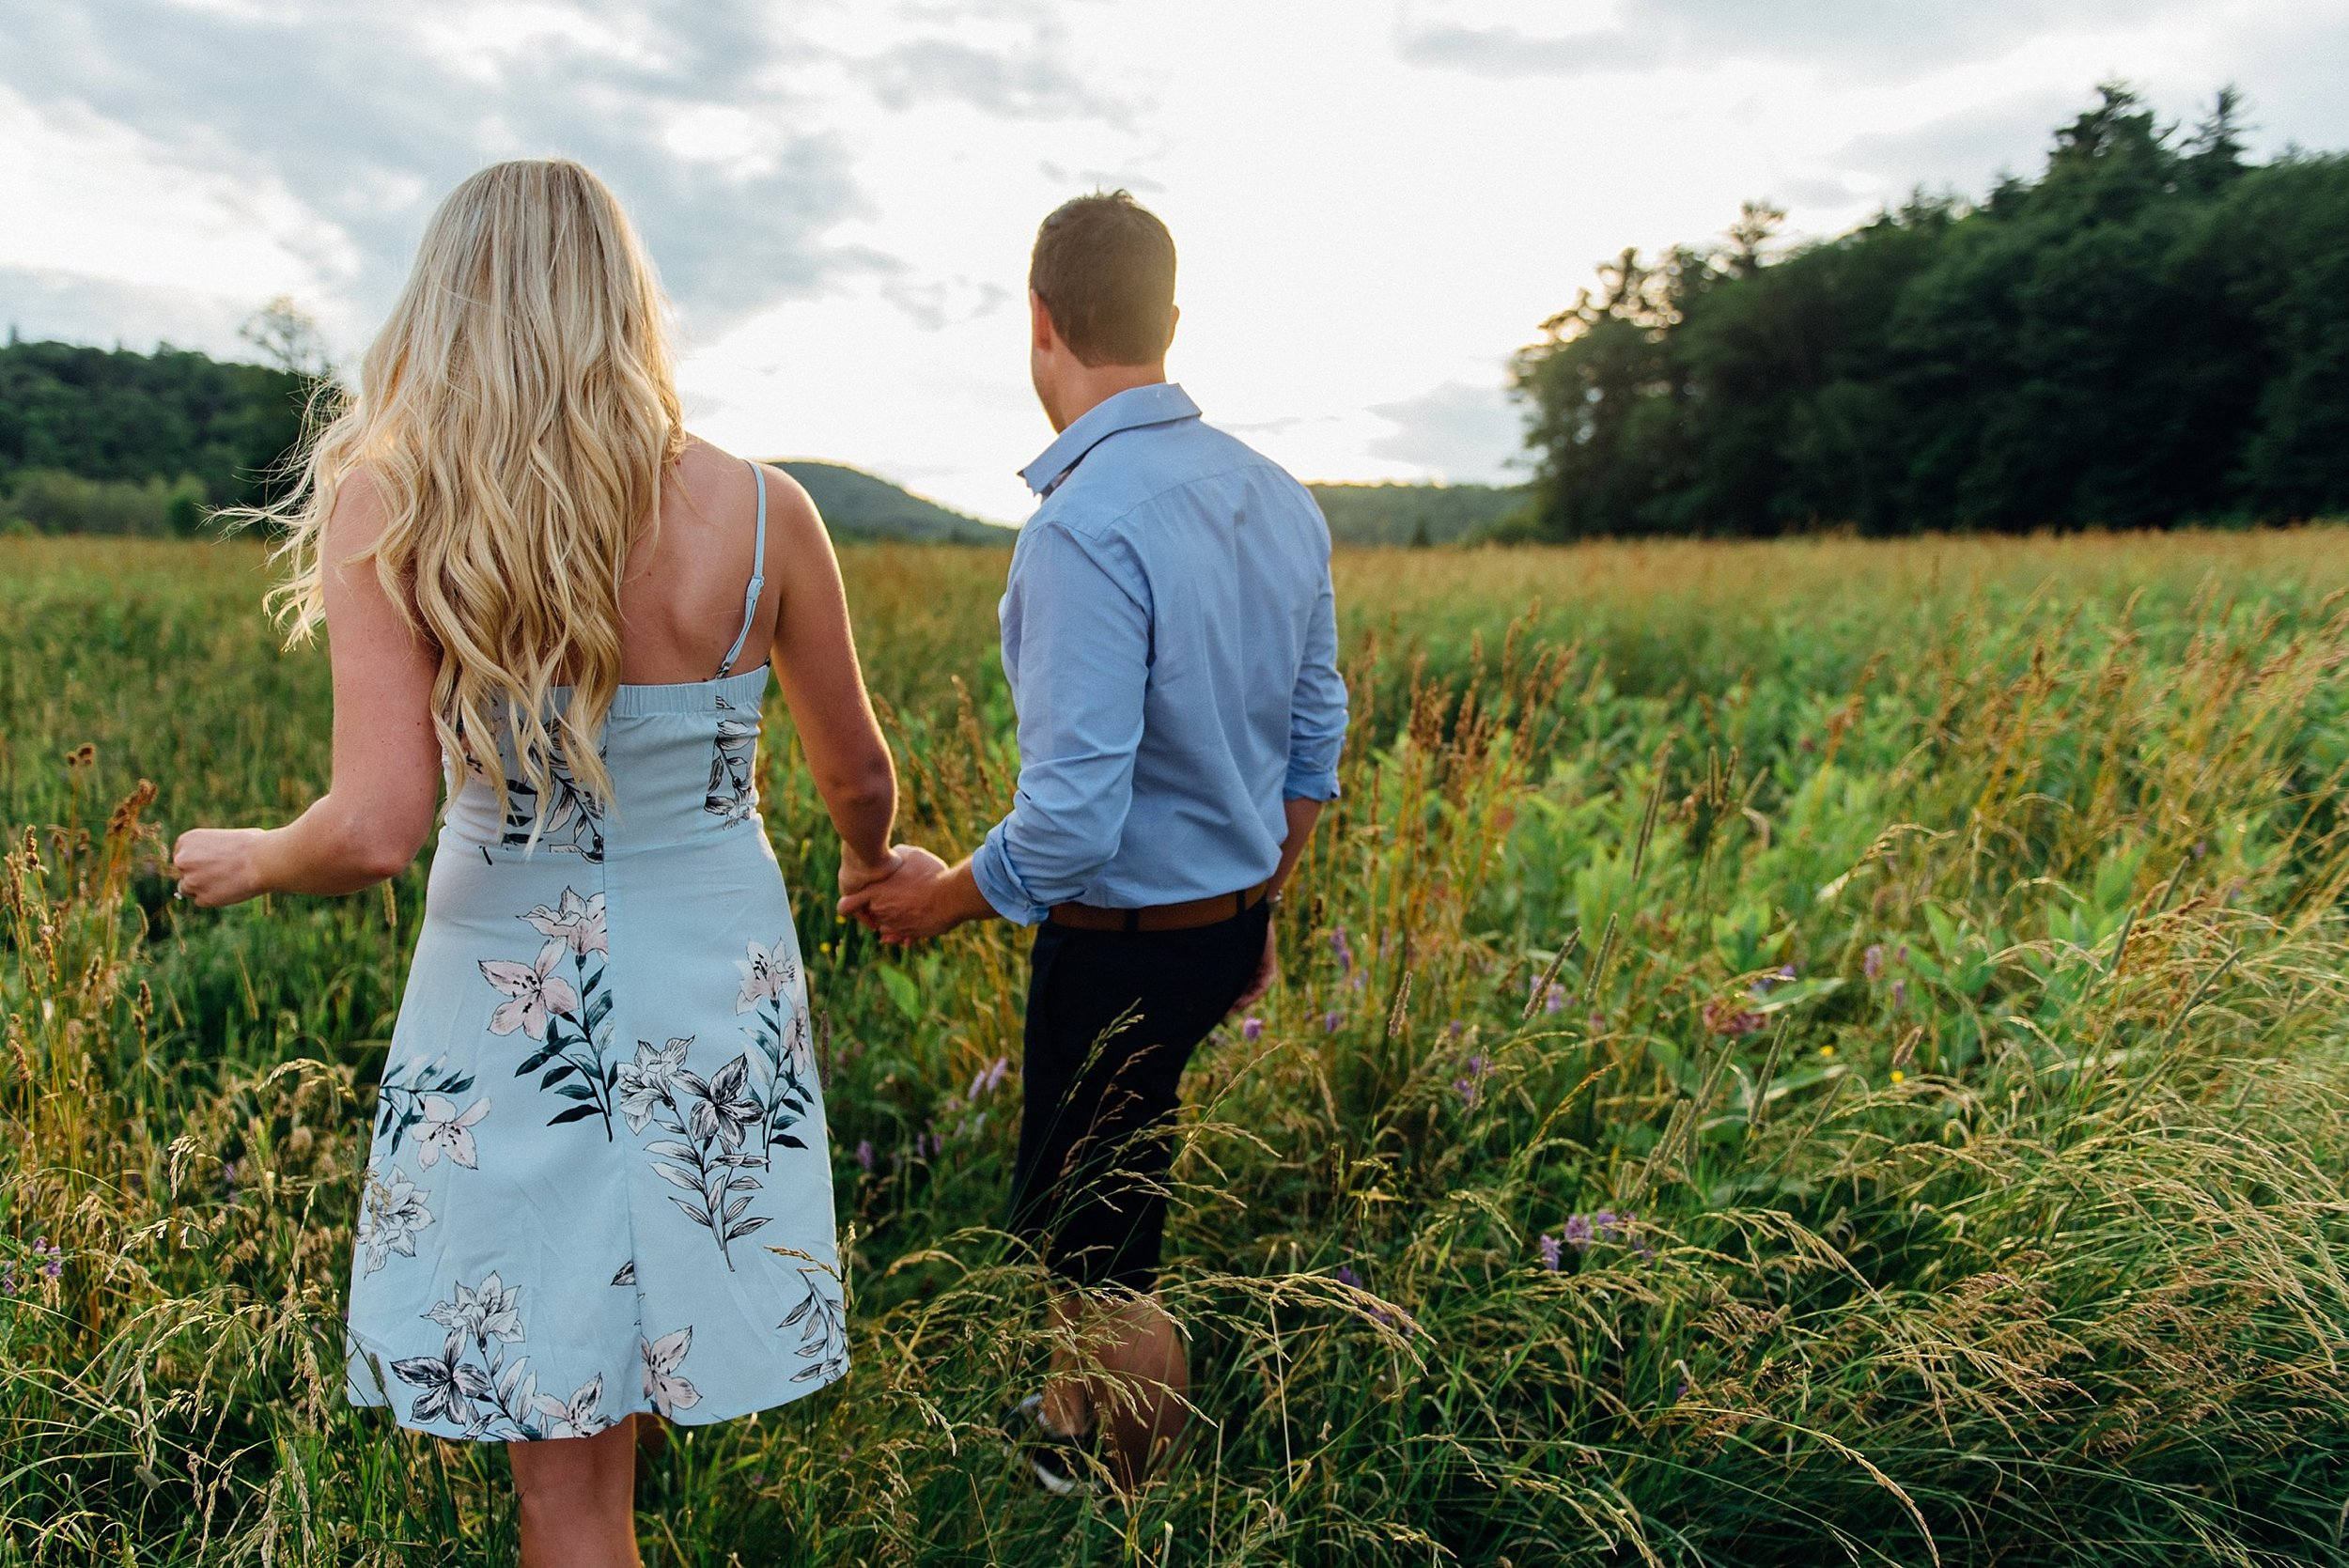 Ali and Batoul Photography - light, airy, indie documentary Ottawa wedding photographer_0041.jpg